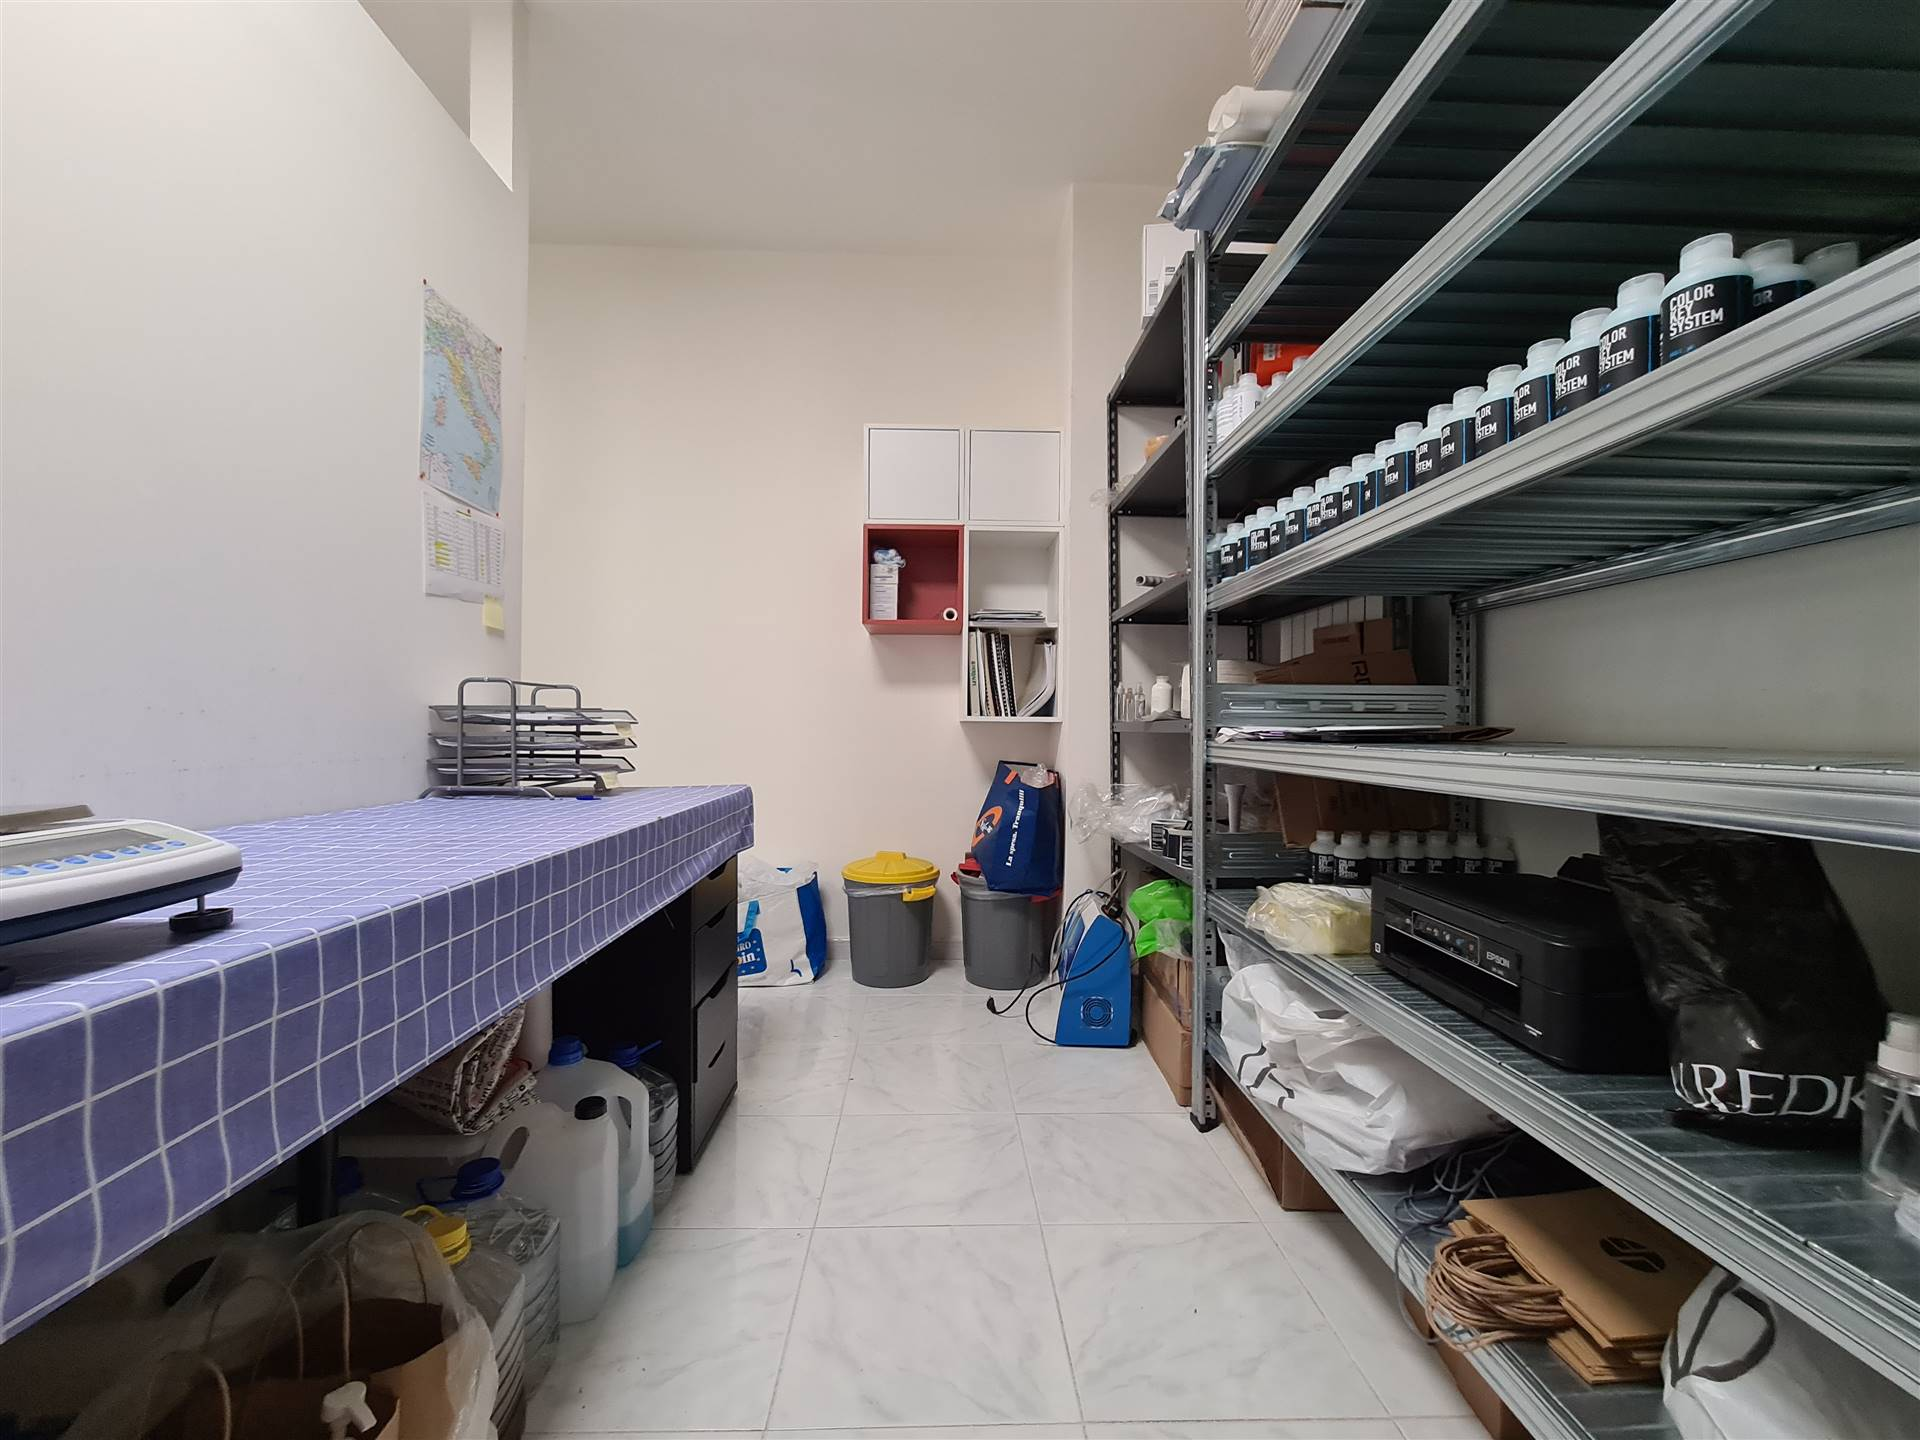 UF027D-Ufficio-SANTA-MARIA-CAPUA-VETERE-Via-Lugnano